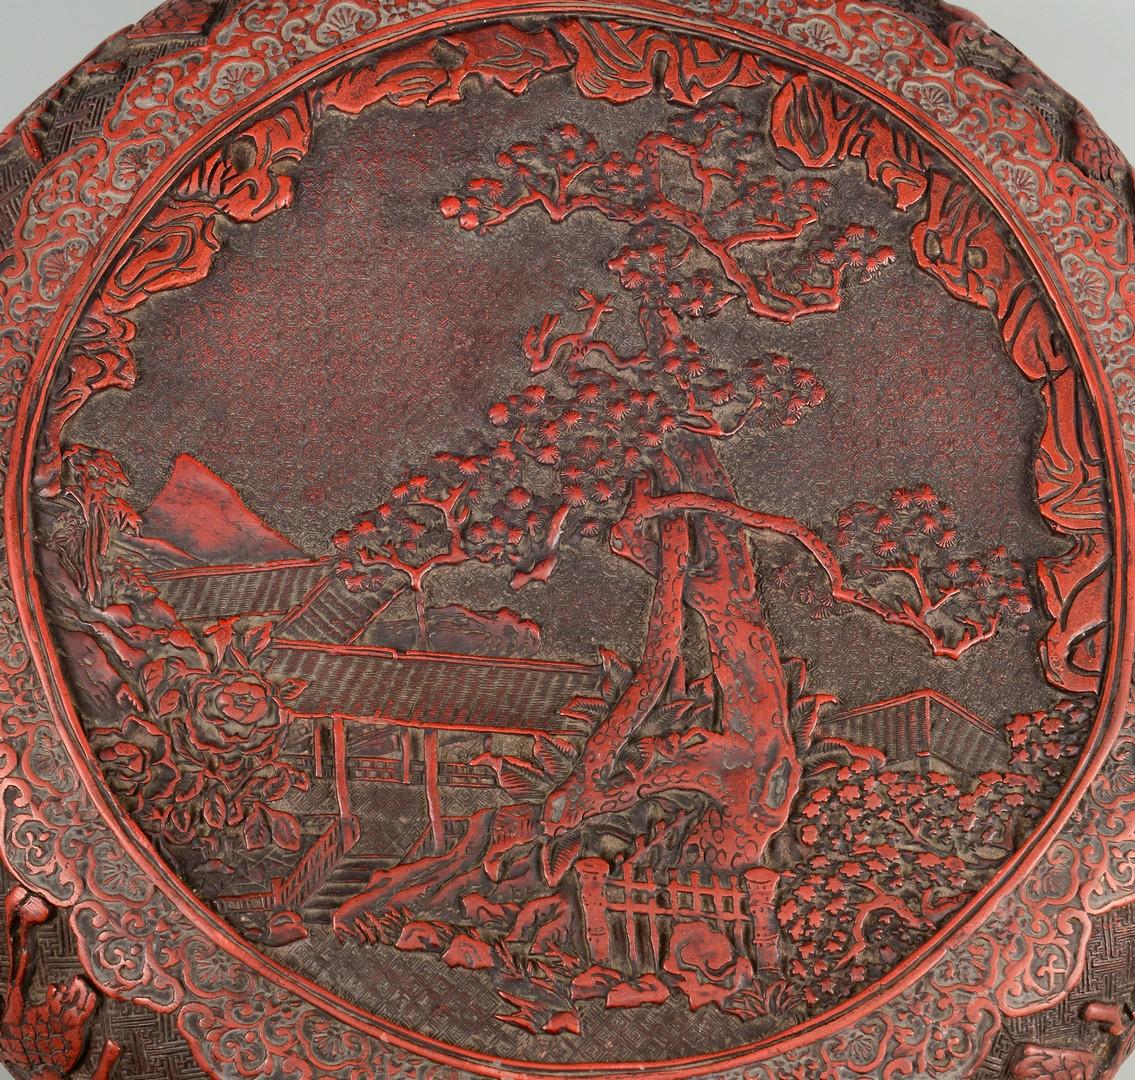 Lot 7: Chinese Cinnabar Covered Circular Box